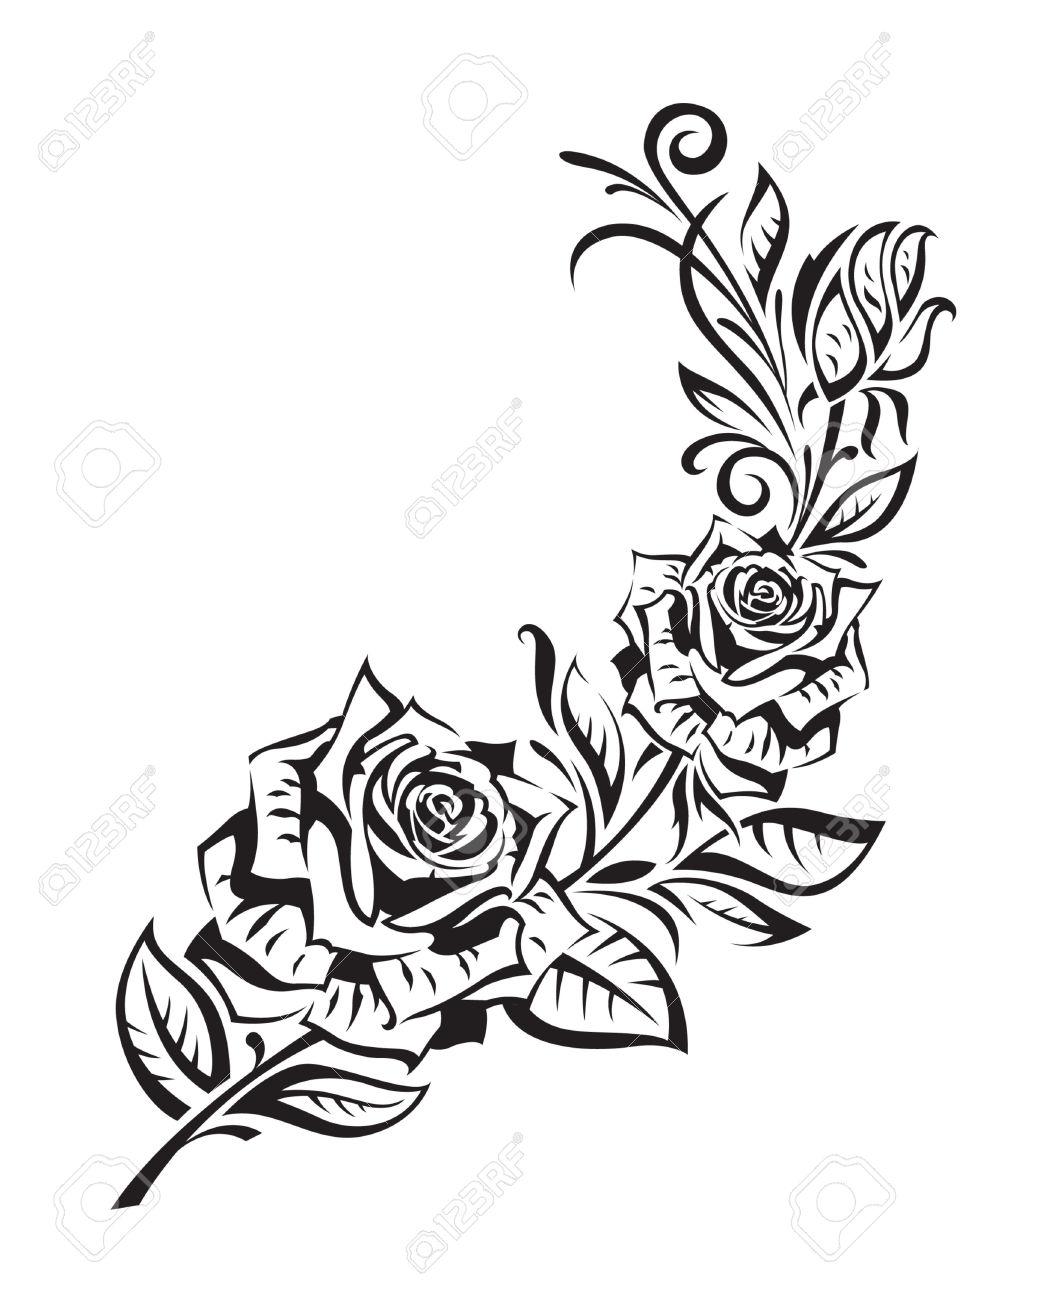 Drawn rose bush black gray rose Vector 25657895  on rose